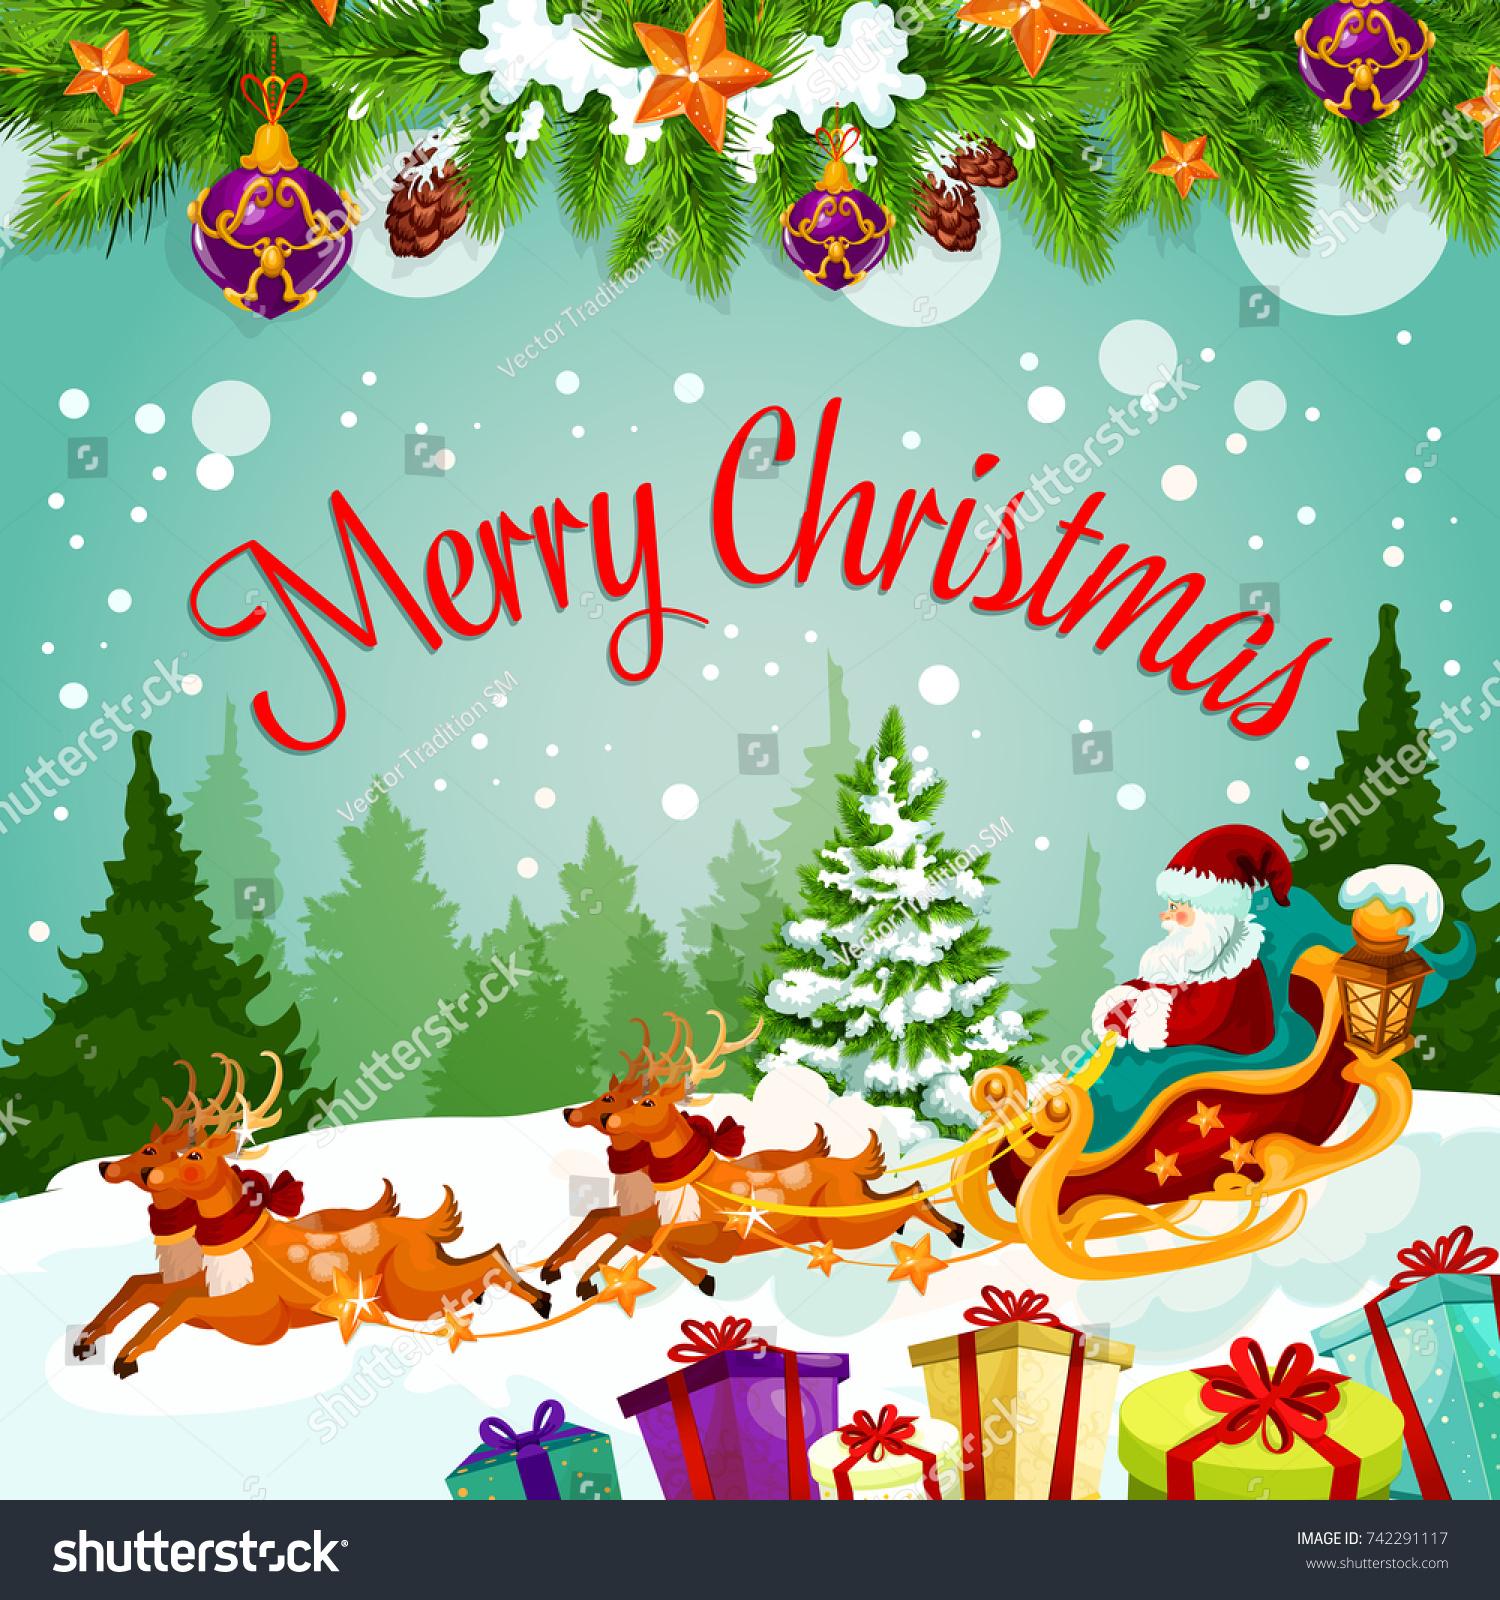 Merry christmas greeting card santa on stock vector 742291117 merry christmas greeting card of santa on reindeer sleigh with gifts bag vector christmas tree kristyandbryce Image collections